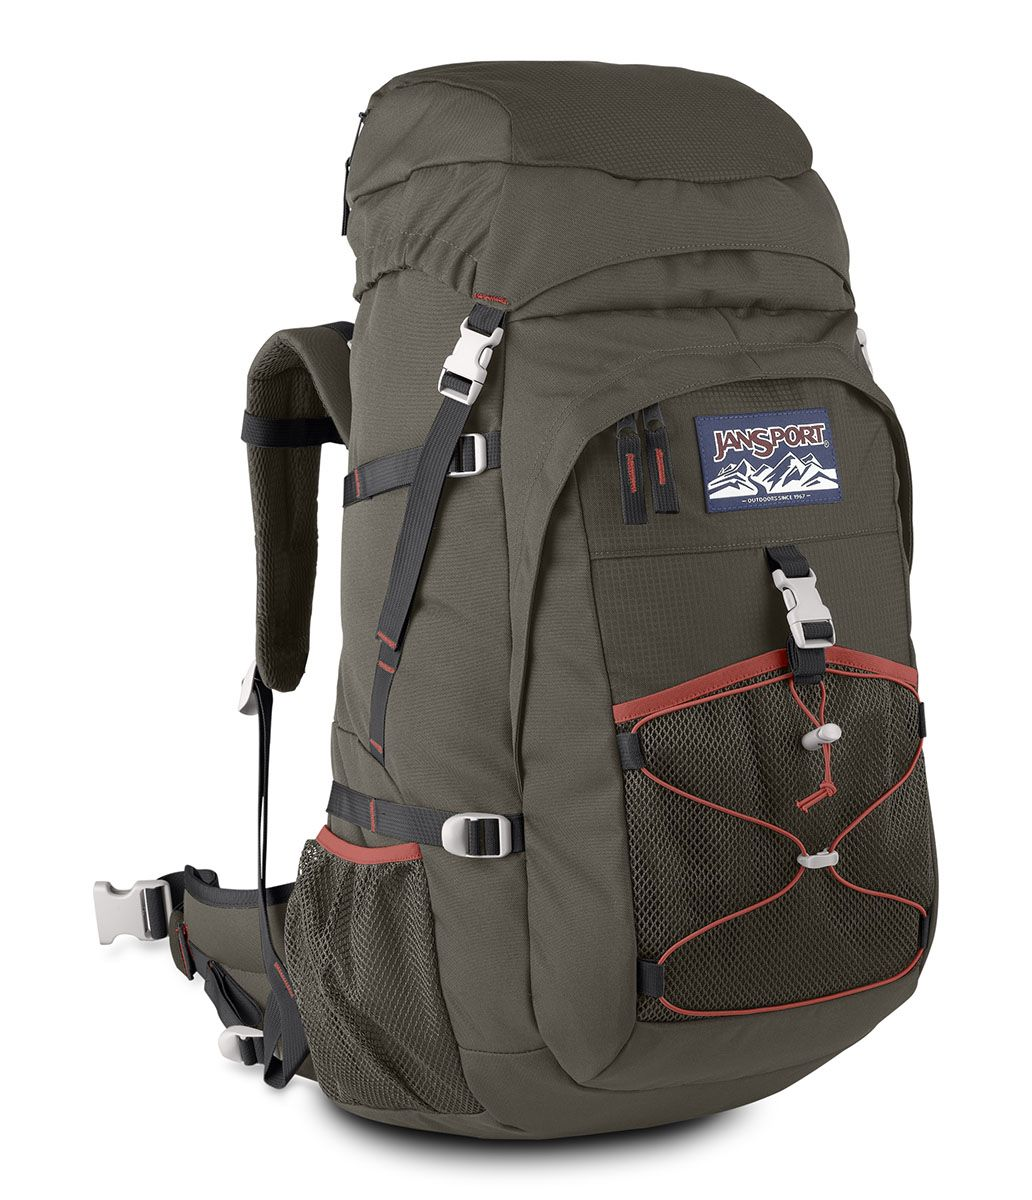 Extra Large Camping Backpack JanSport Big Bear 63